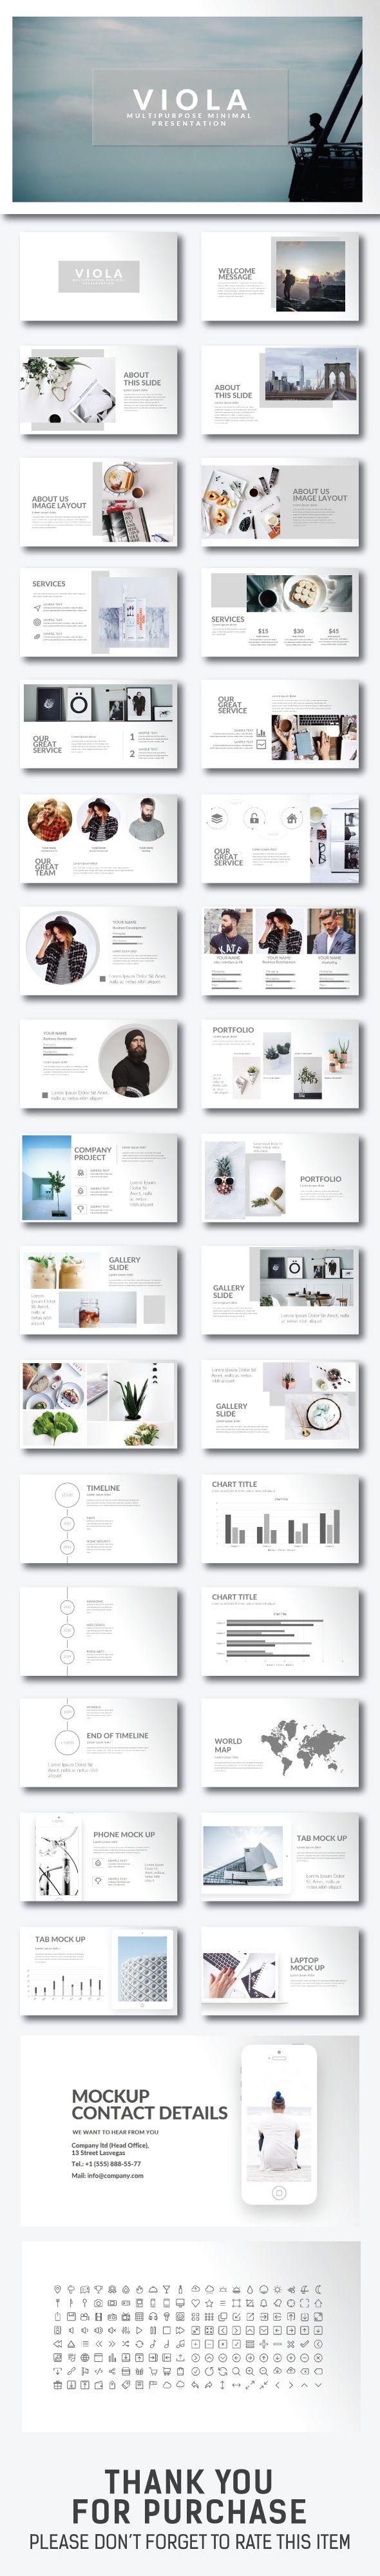 Viola Minimal Presentation - Creative PowerPoint Templates